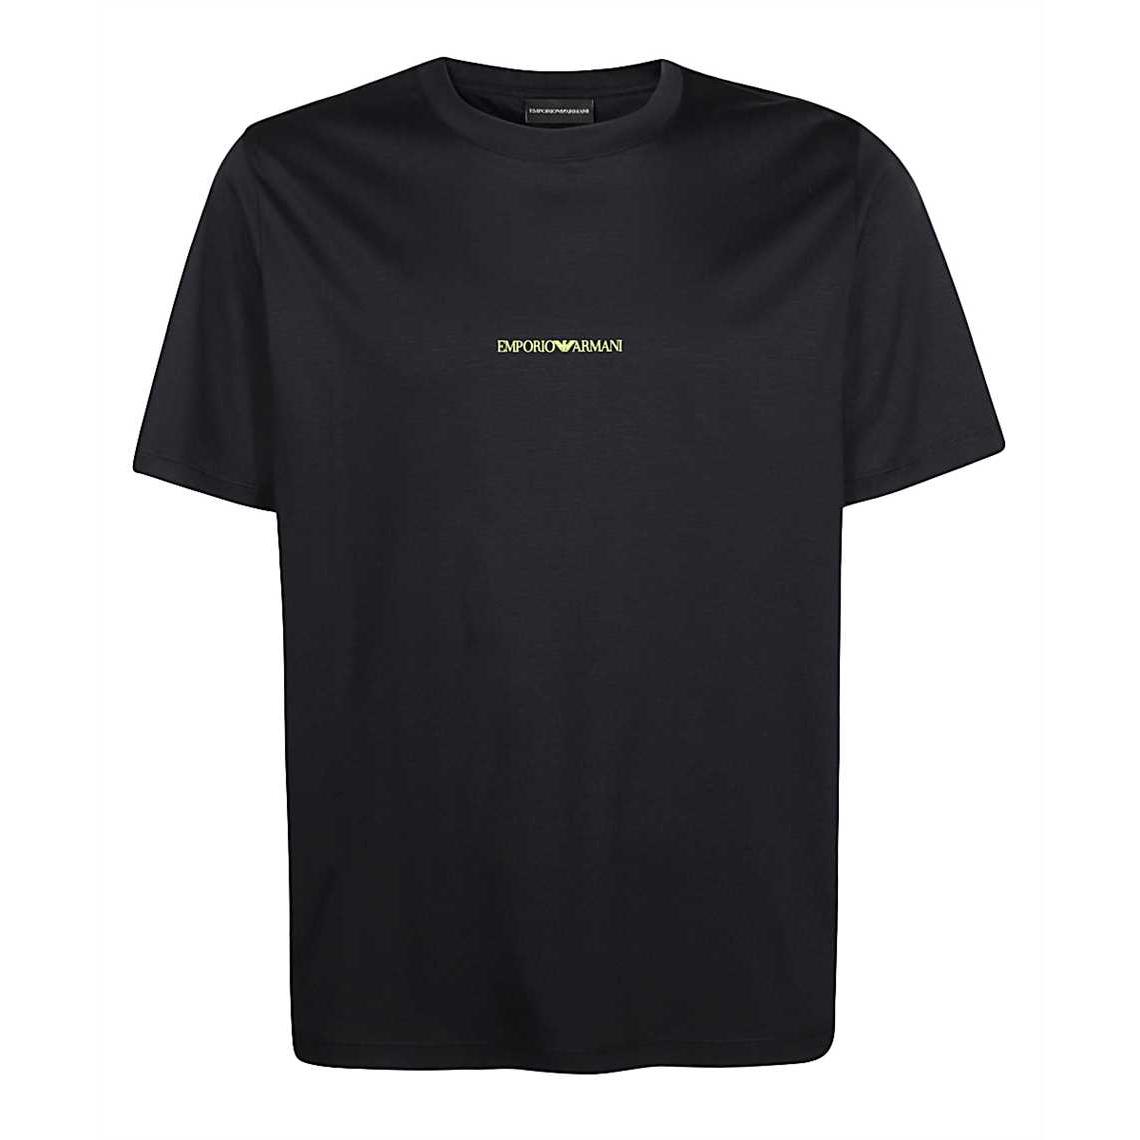 تیشرت آستین کوتاه مردانه امپریو آرمانی مدل 3H1T781JSTZ-0922 -  - 3